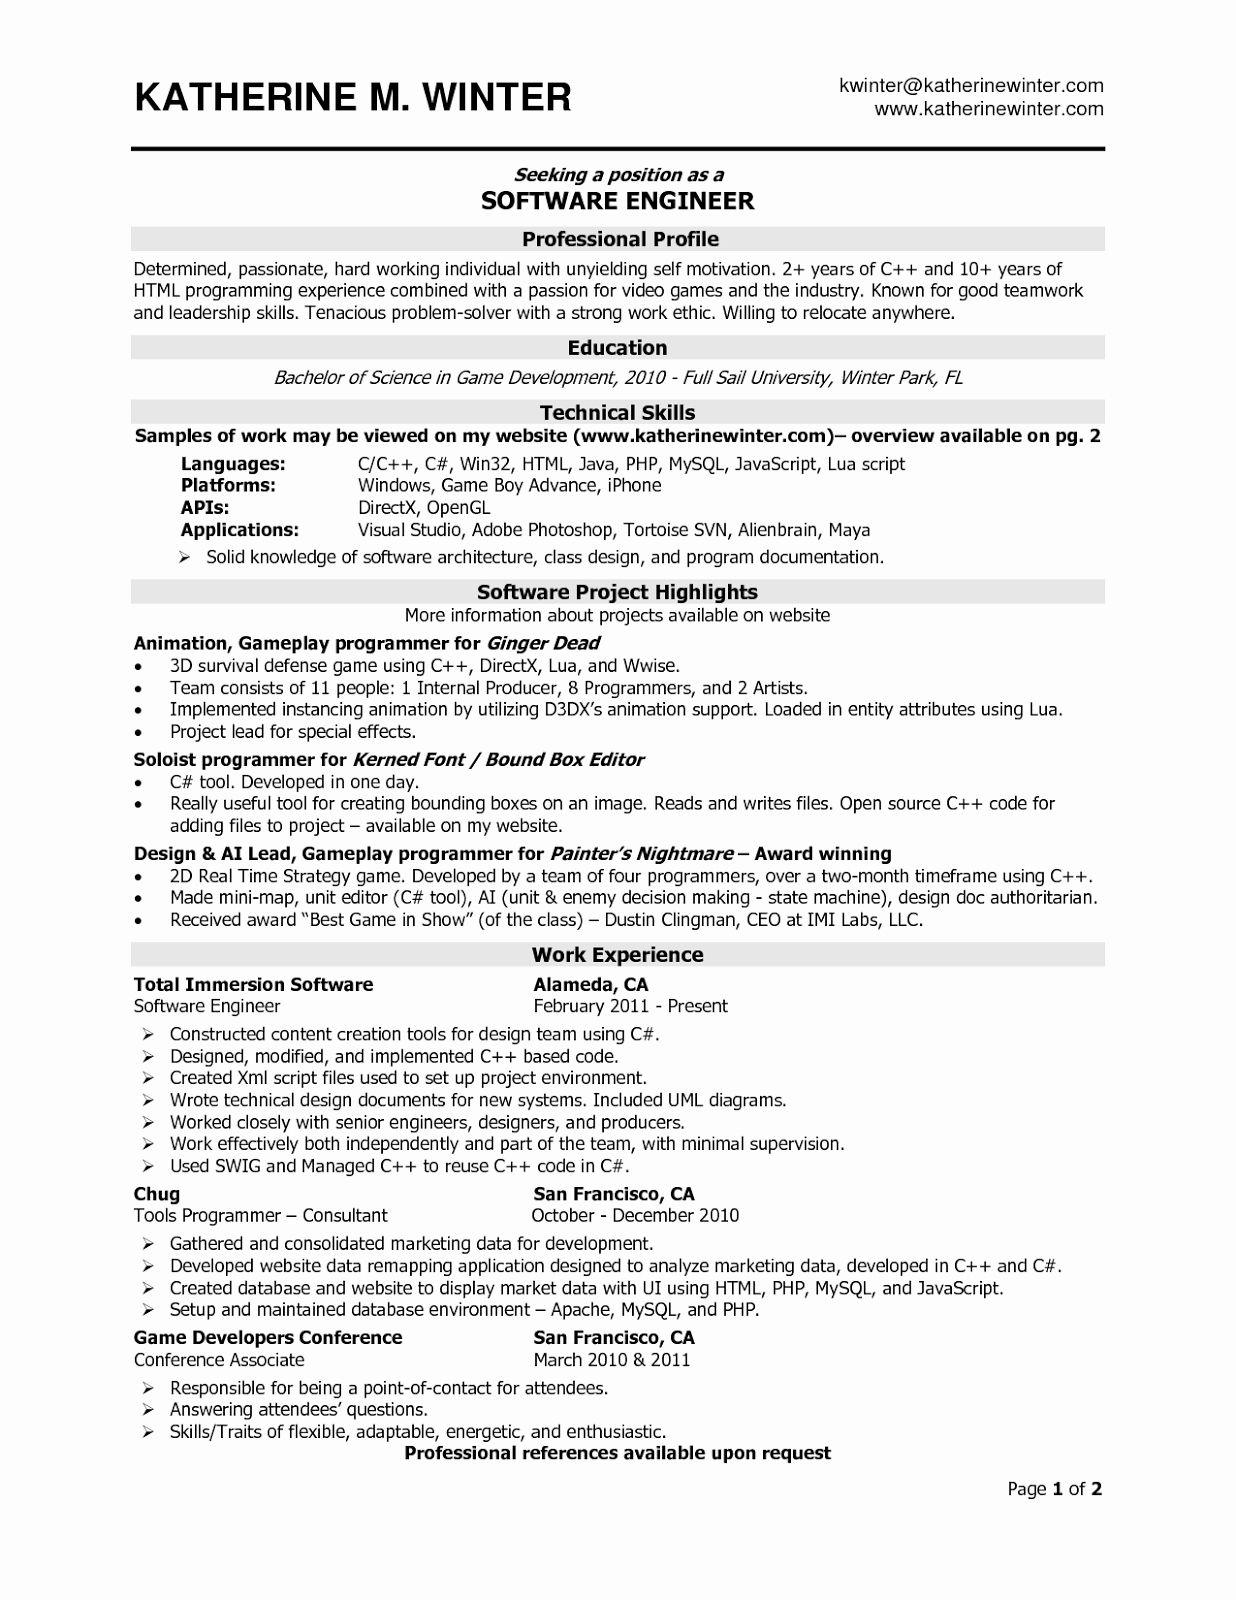 Free Resume Templates 2018 Doc Freeresumetemplates Resume